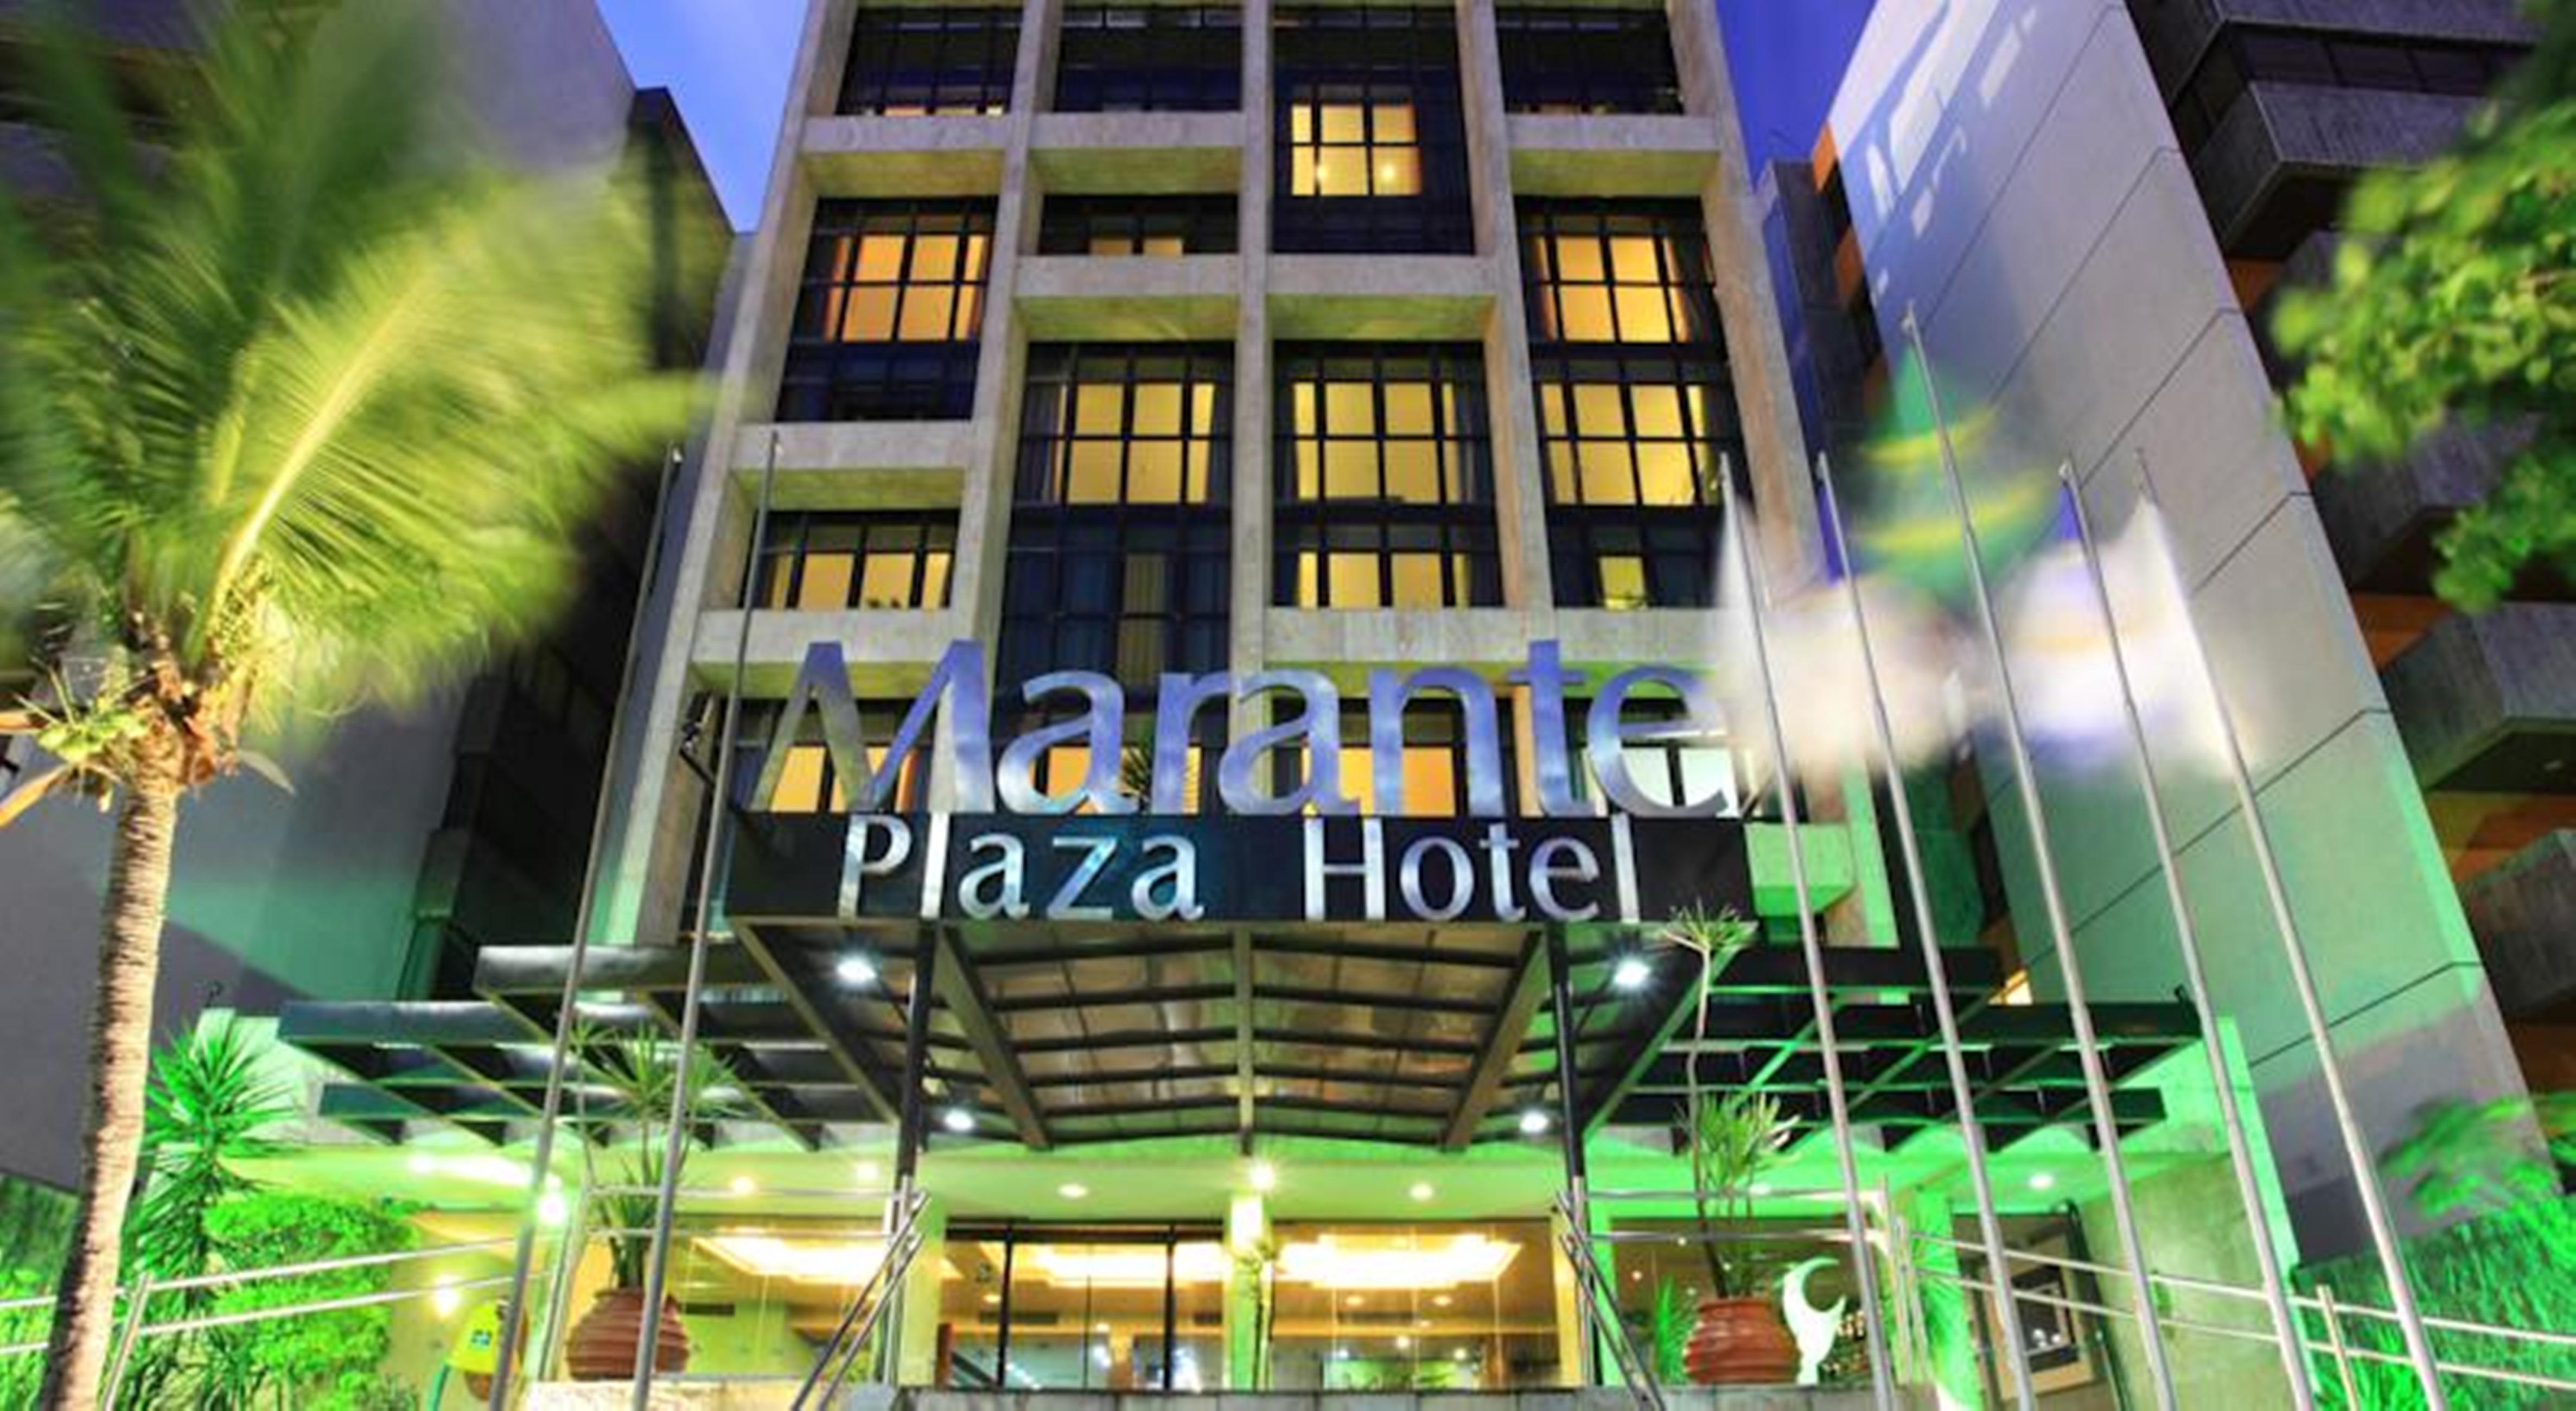 Marante Plaza Hotel, Recife